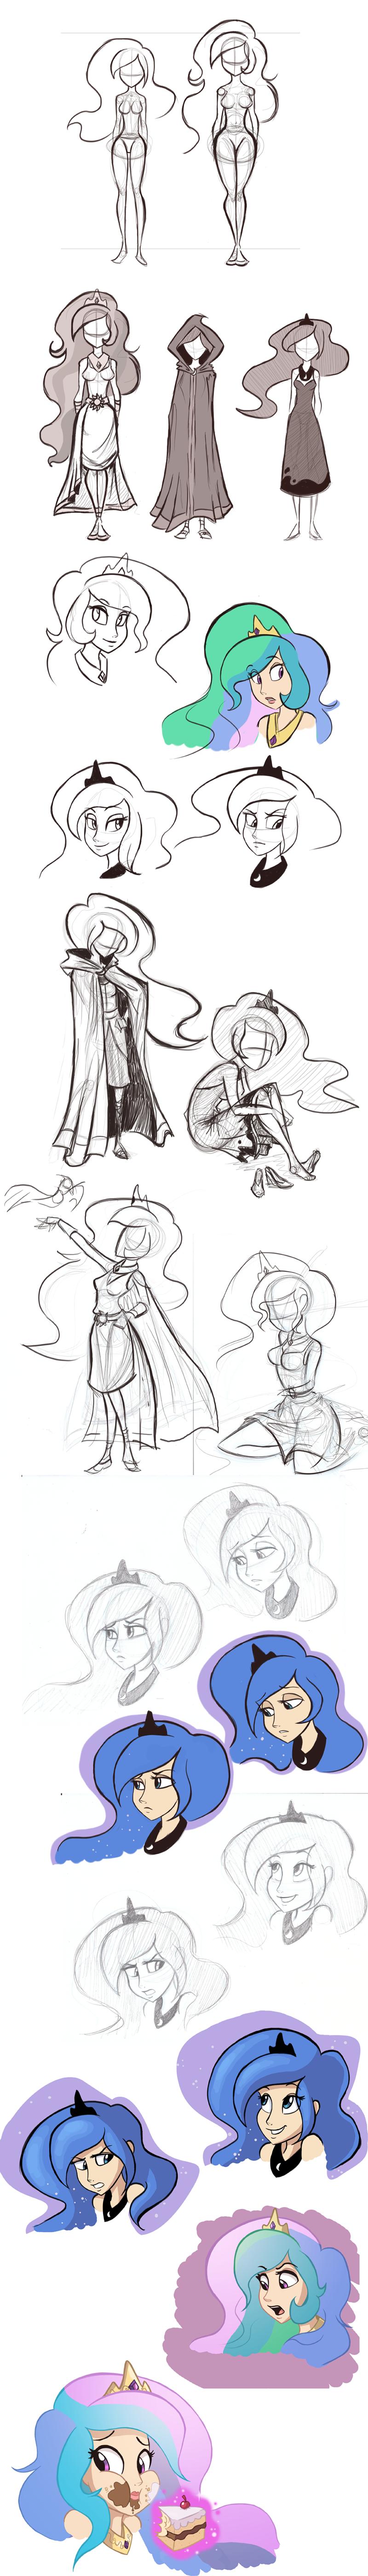 Luna and Celestia Sketchdump by Ric-M